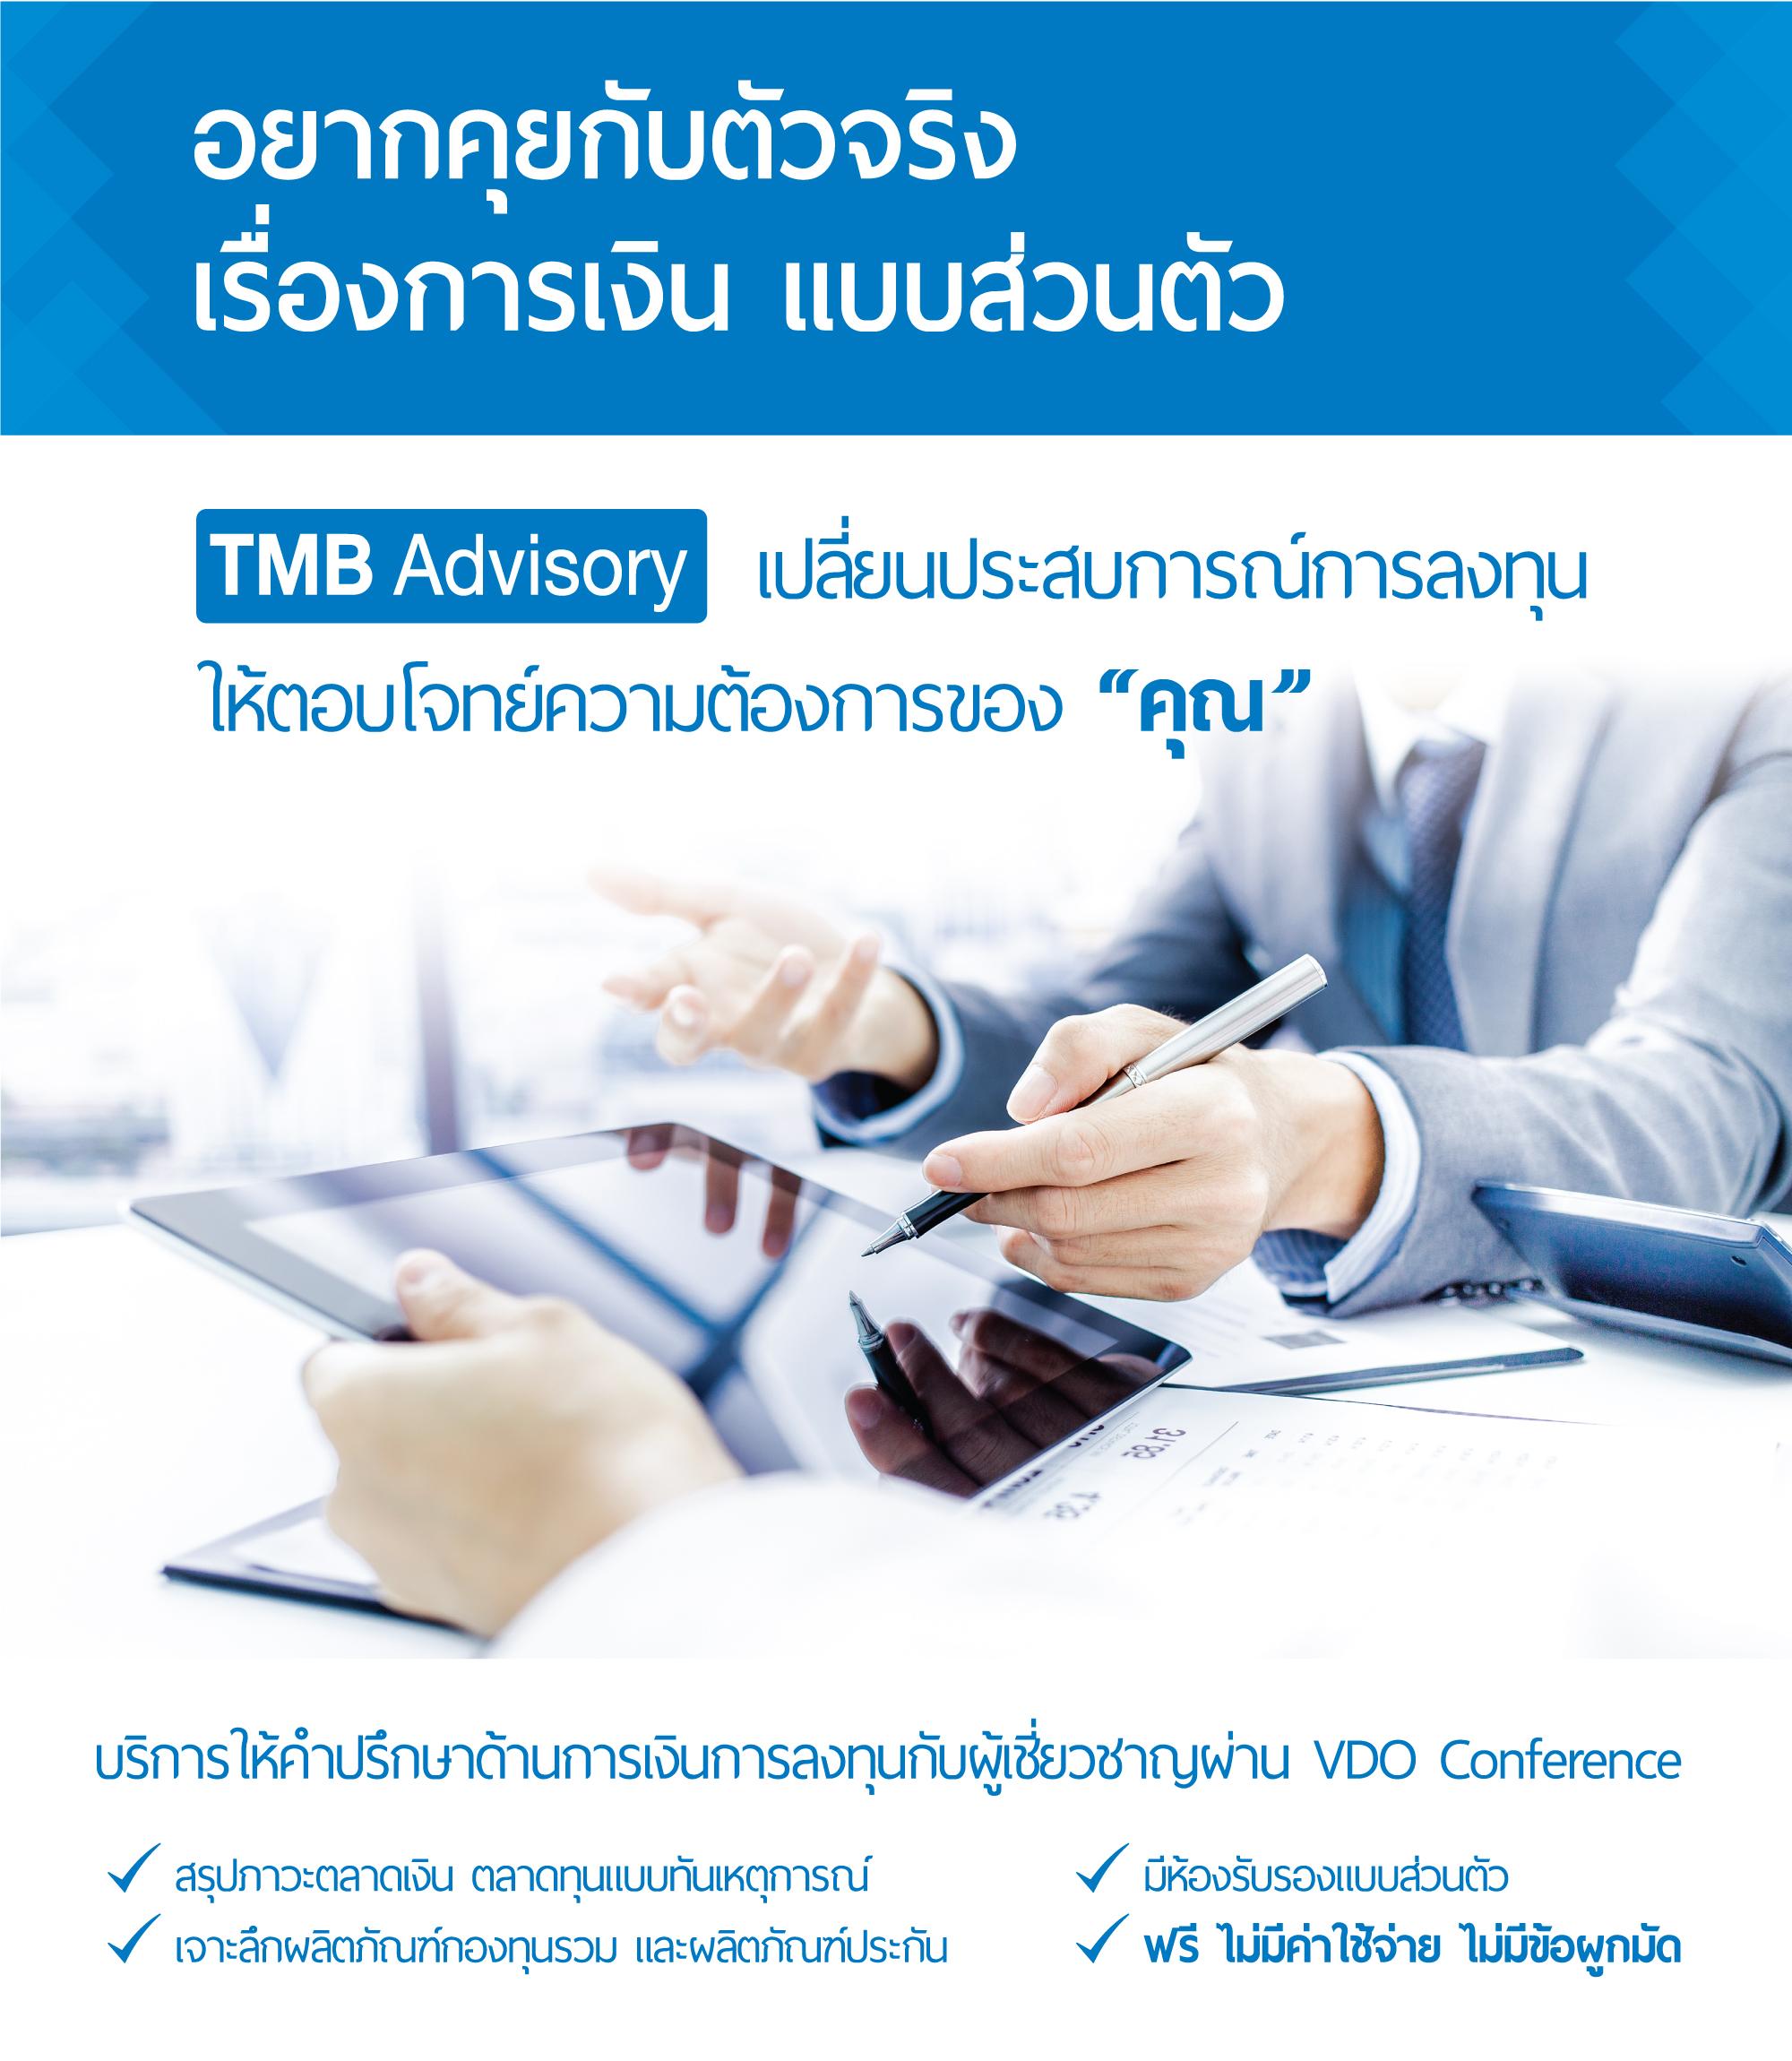 TMB Advisory Room